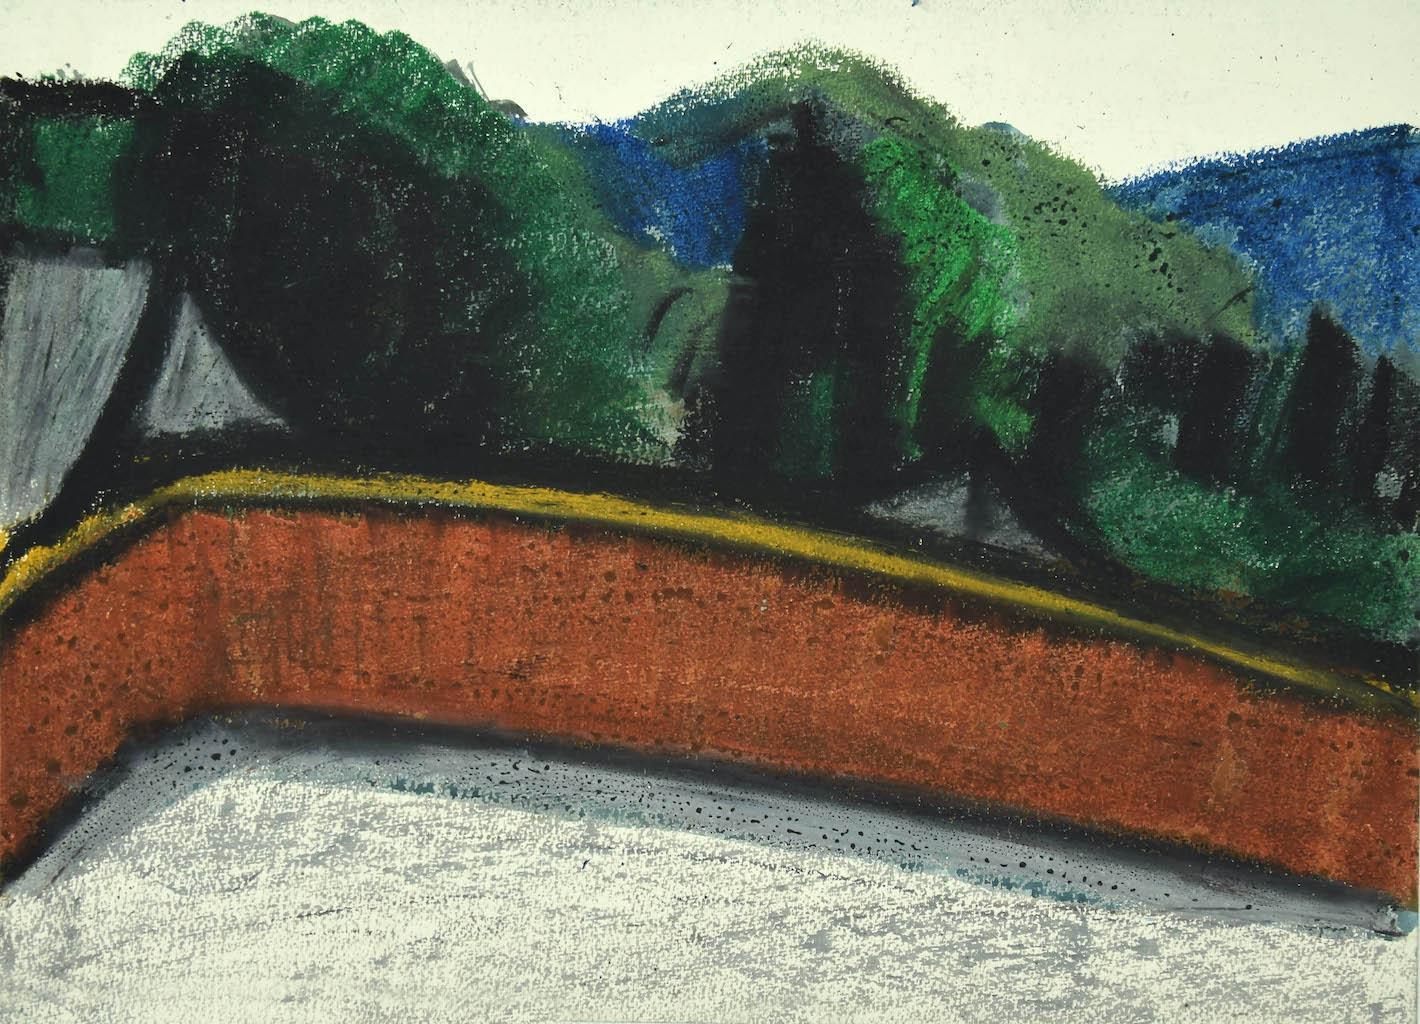 Landscape - Original Mixed Media on Cardboard by Sun Jingyuan - 1970s